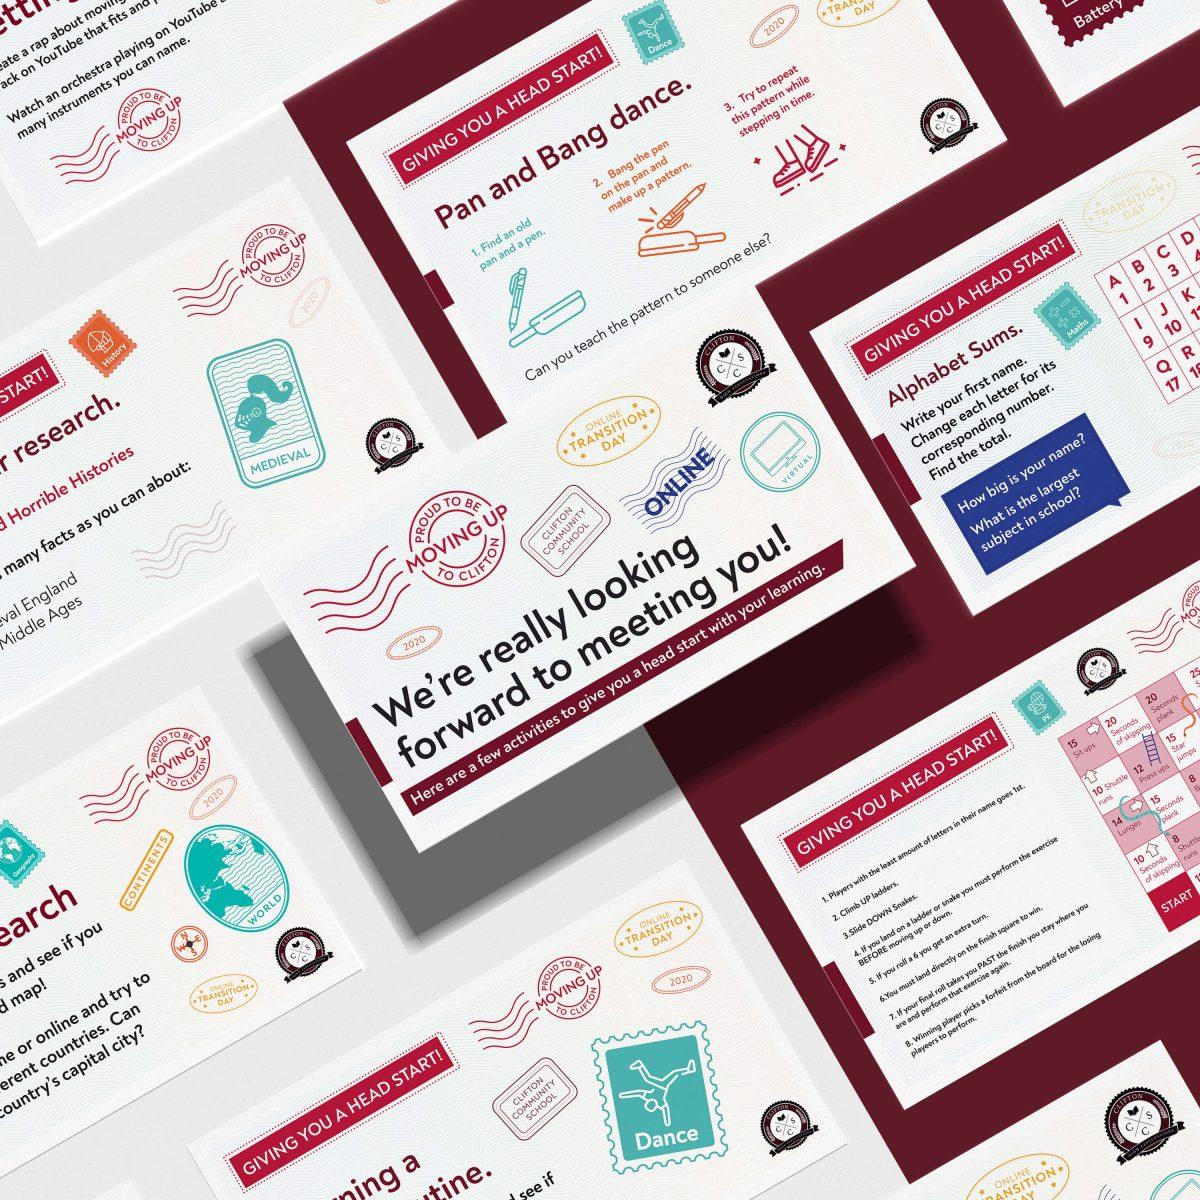 A mockup of several short activities and postcard themed social media graphics.